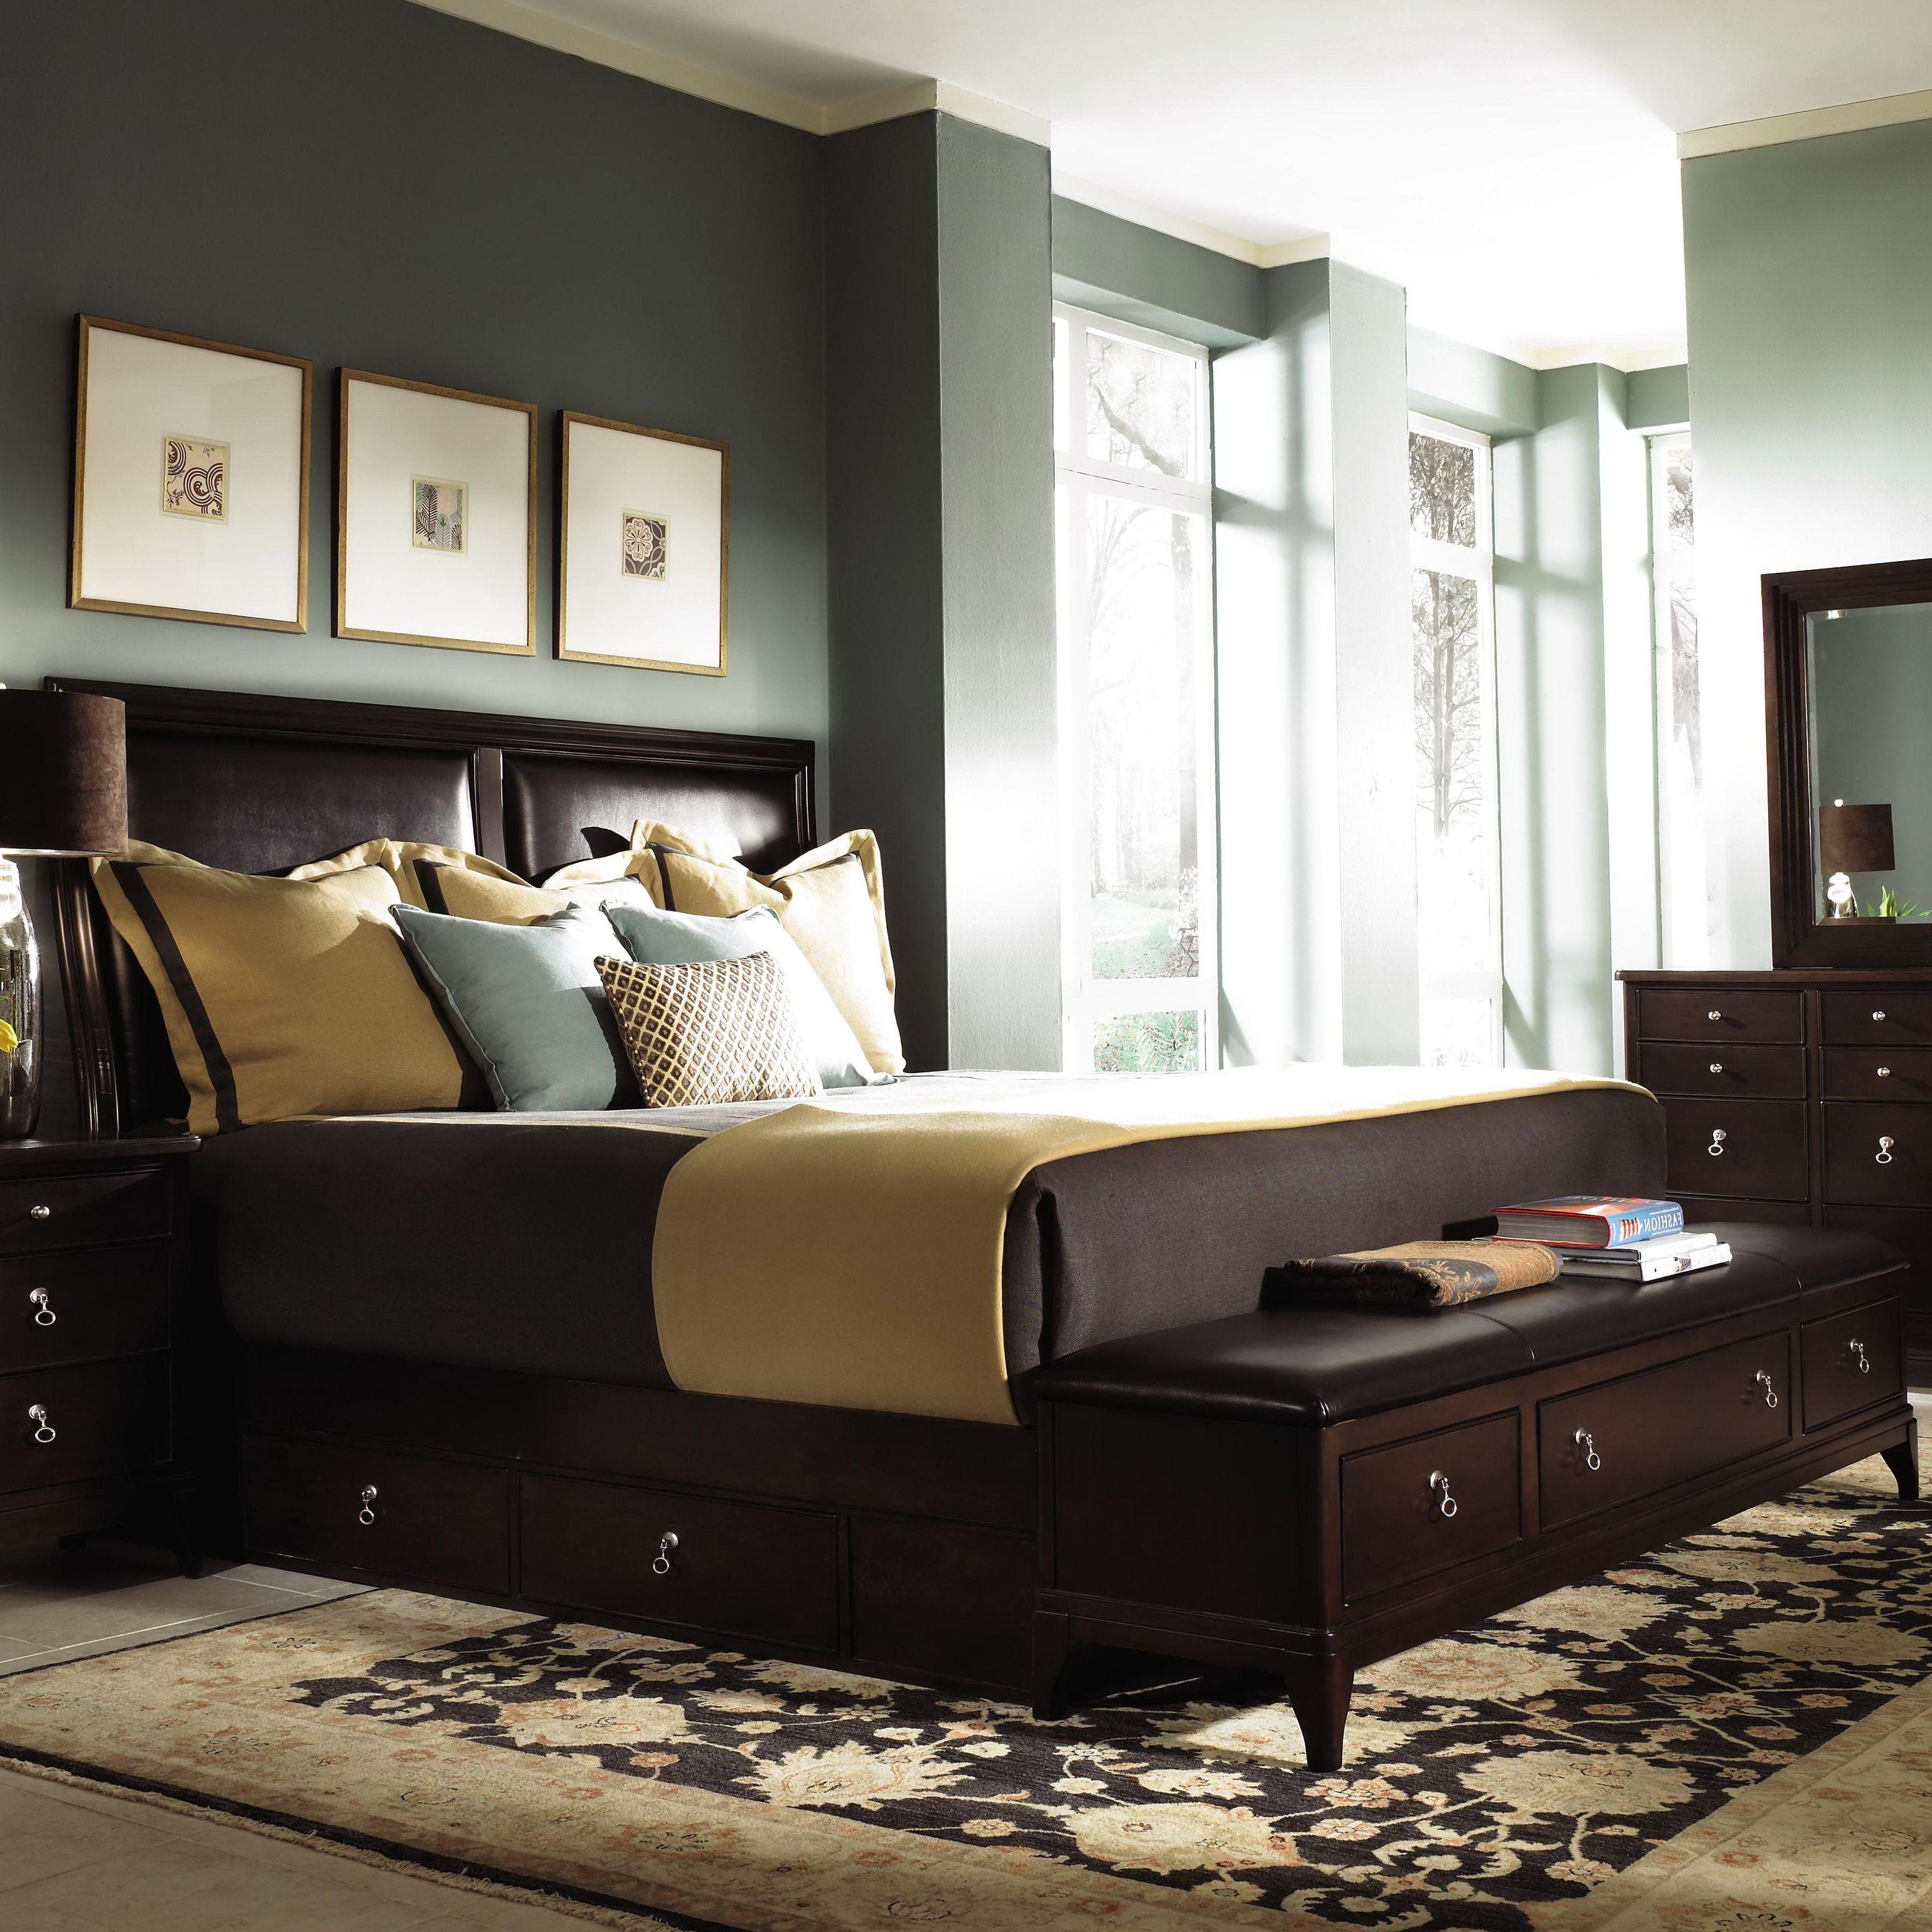 Ikea Design Bedroom Glamorous End Of Bed Storage Bench Ikea  Bedroom  Pinterest  Bed Bench Design Ideas